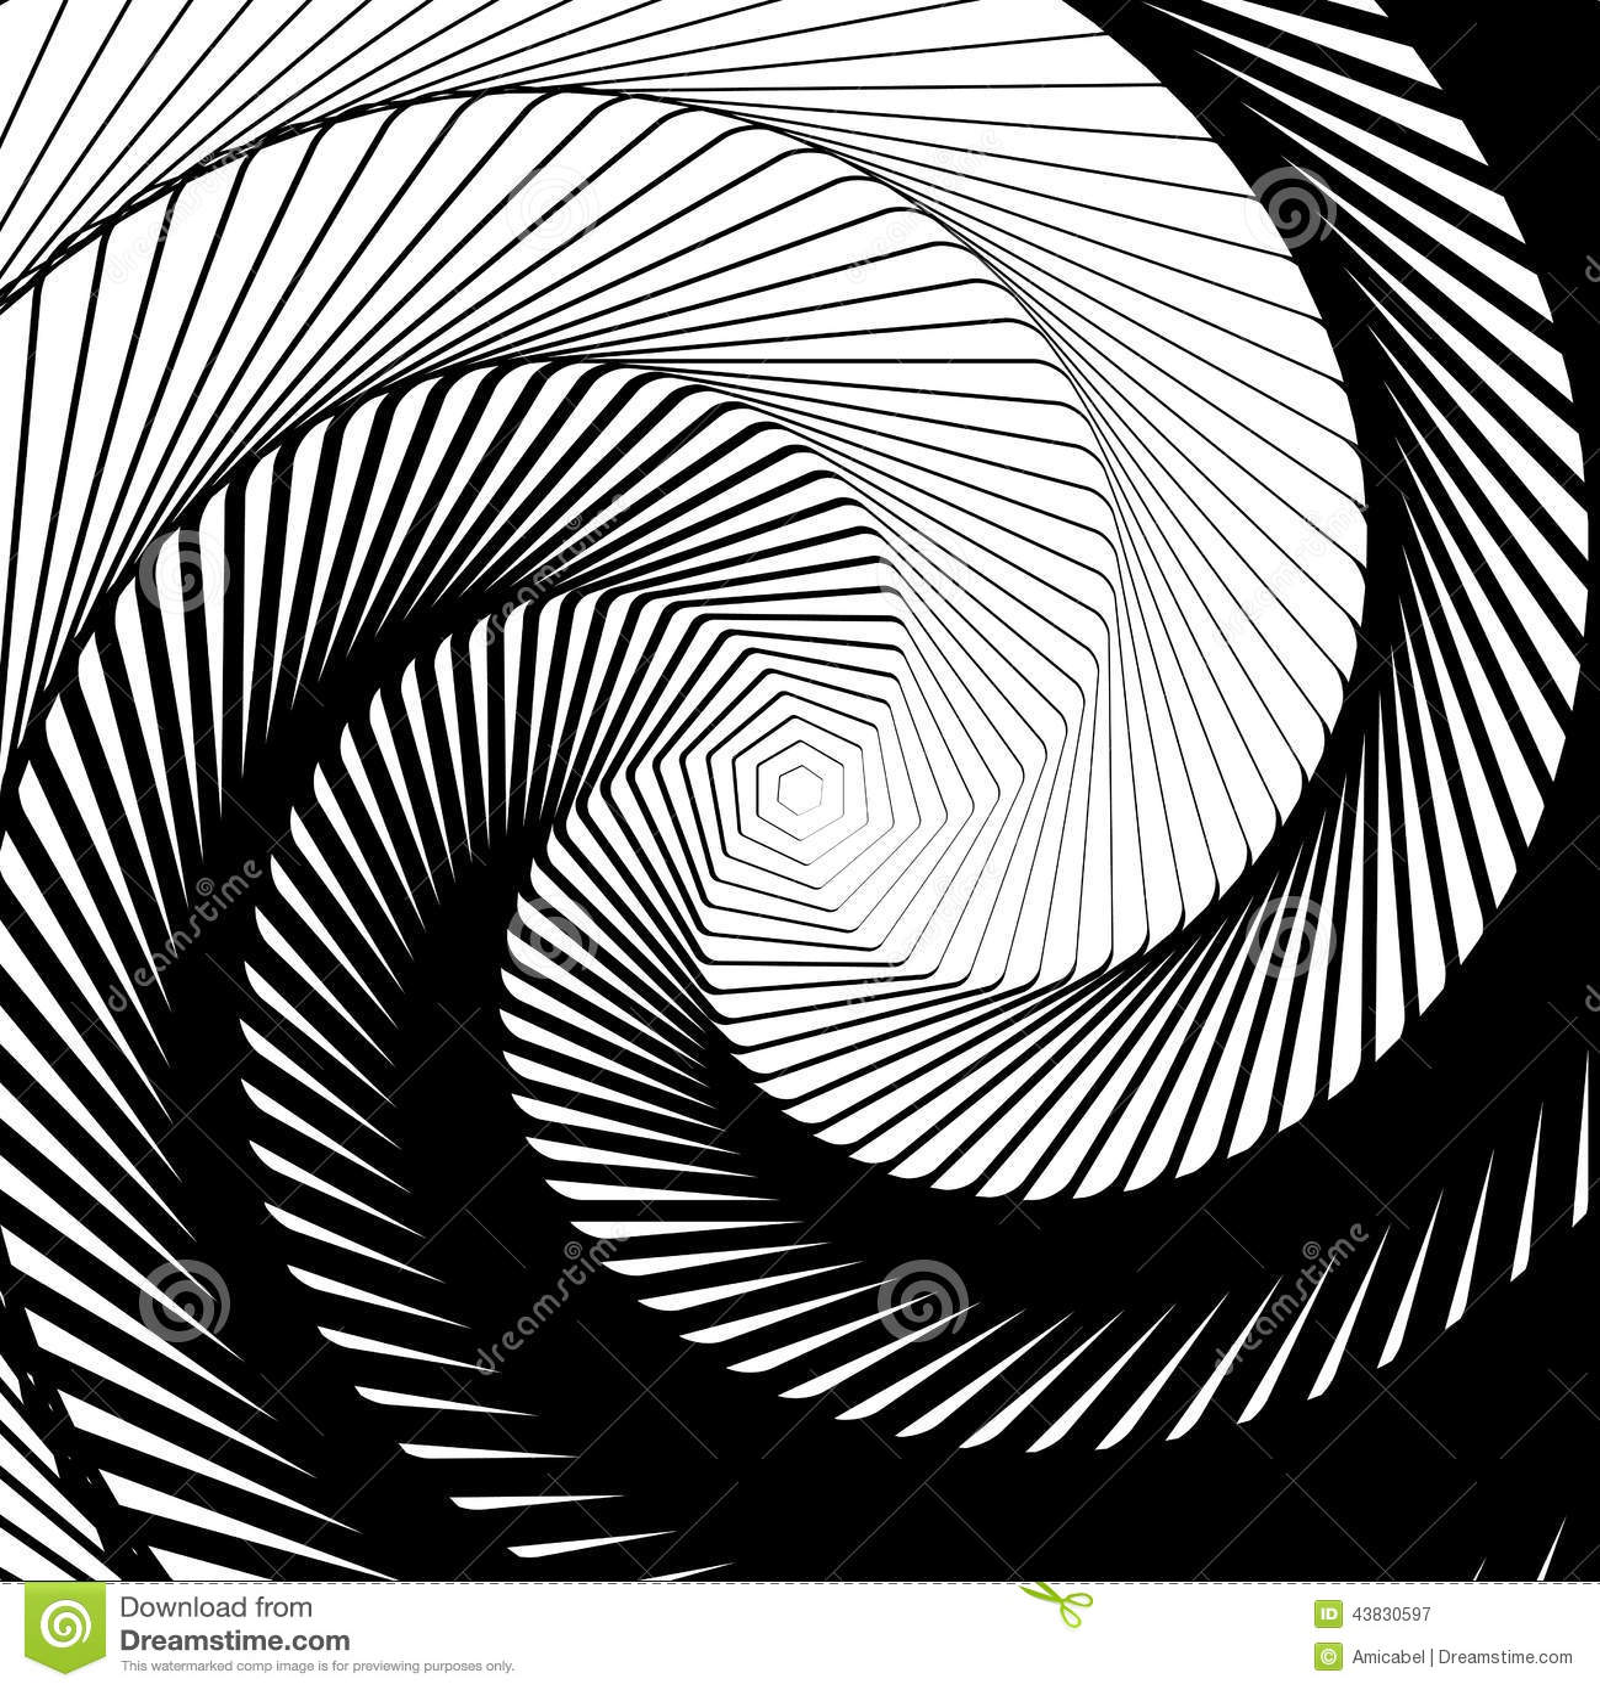 Design whirlpool movement illusion background stock vector for Geometric illusion art